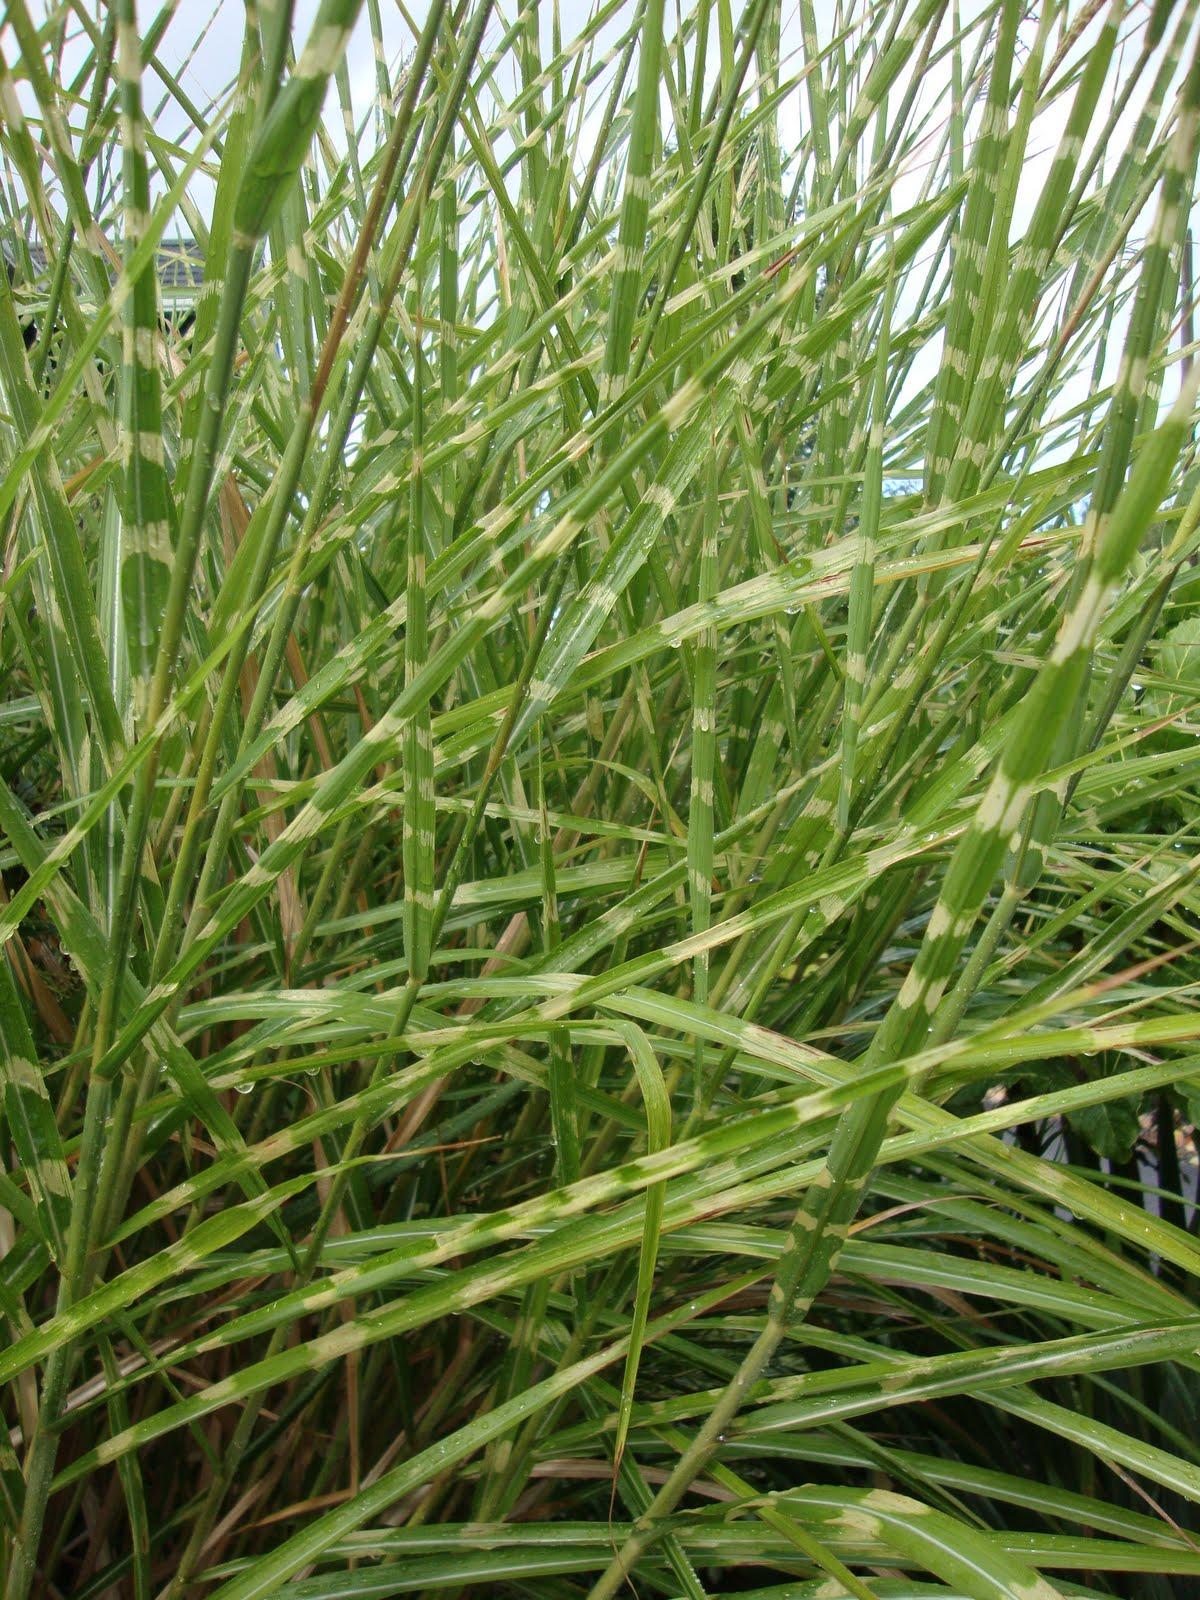 danger garden: Gardening with grasses (not lawn)